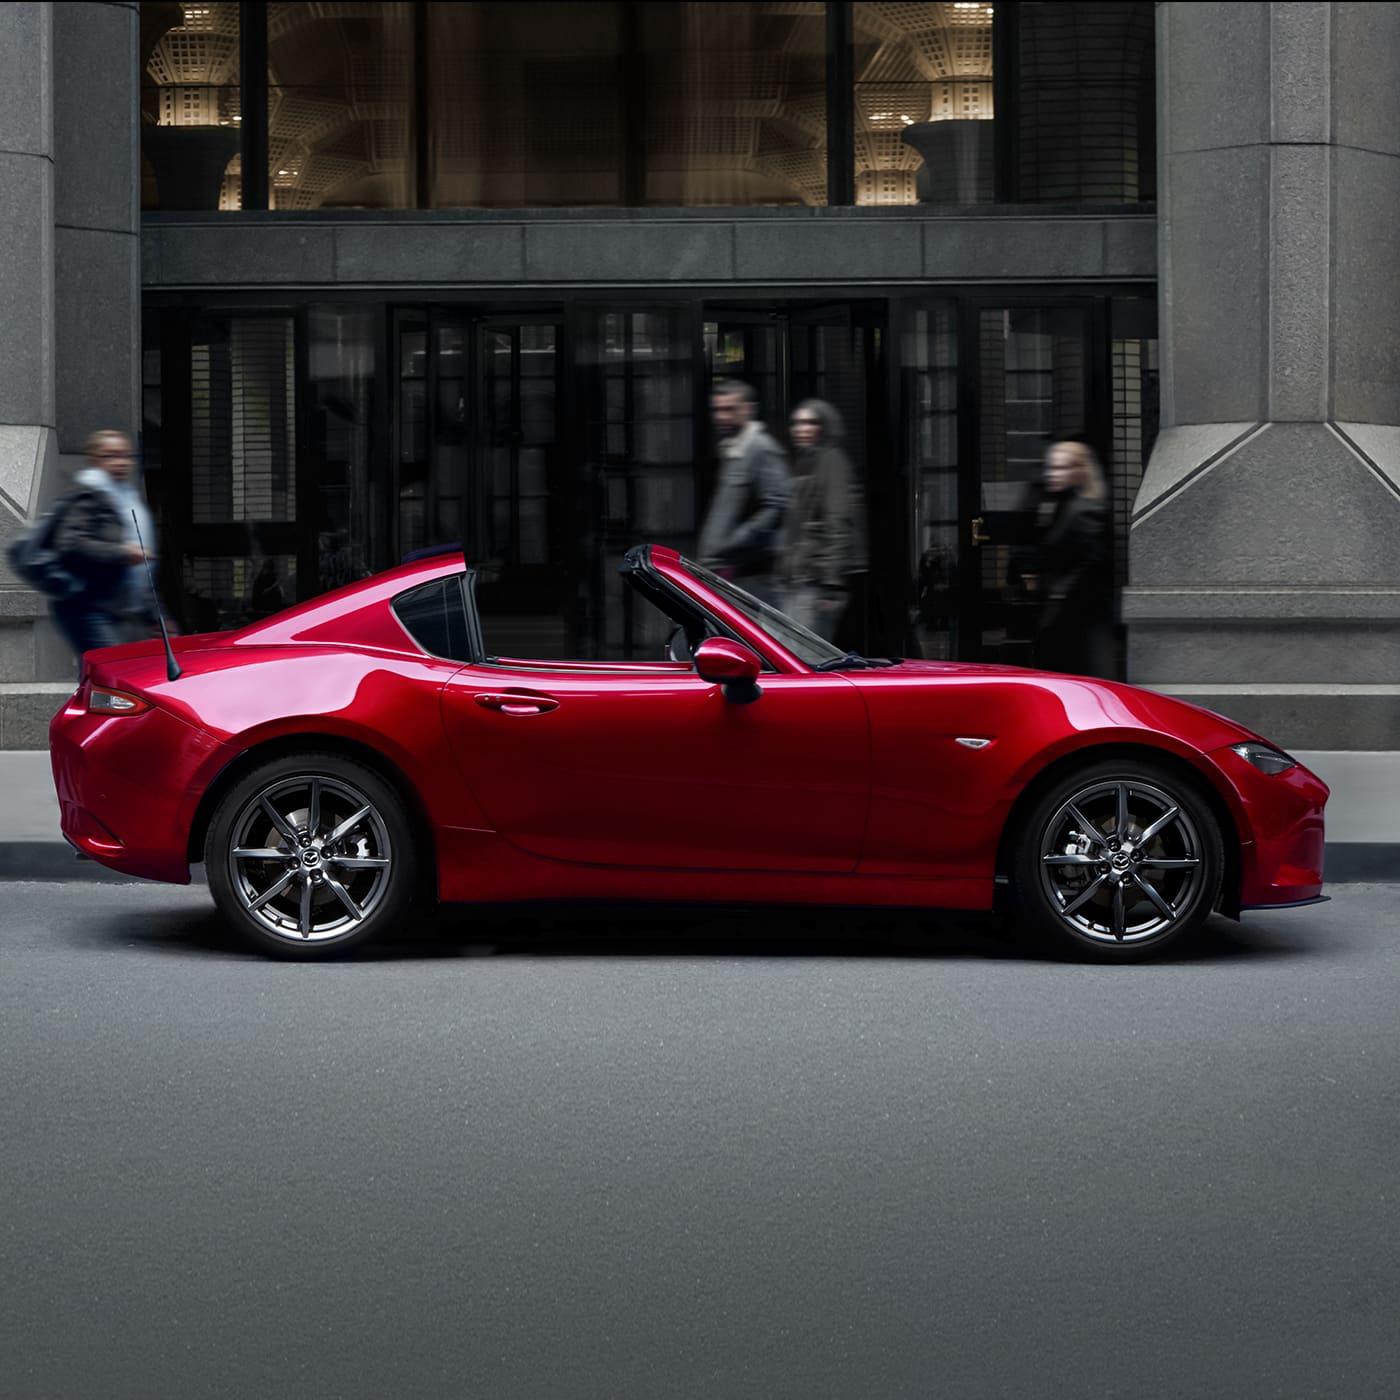 New Mazda MX-5 Sports Car